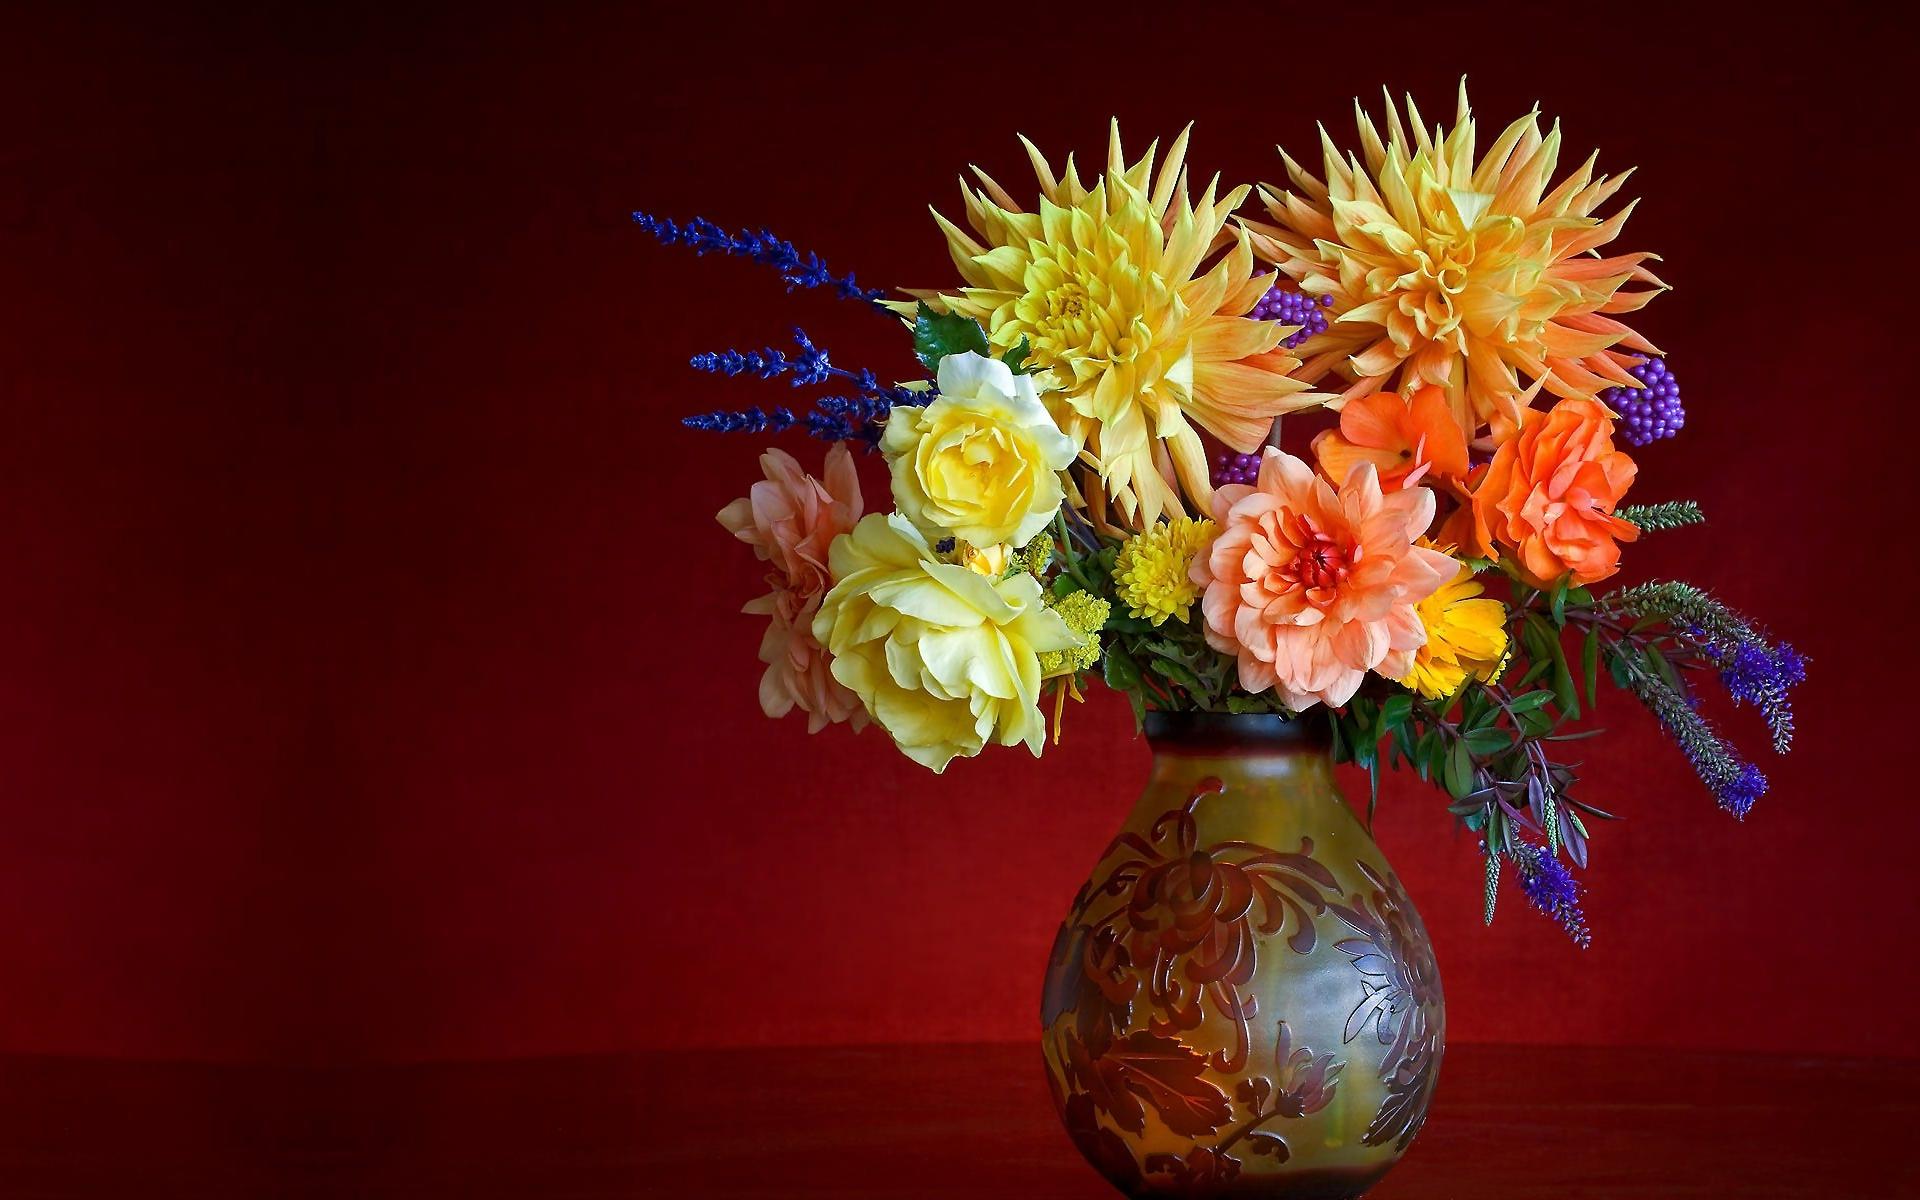 flower vase pictures